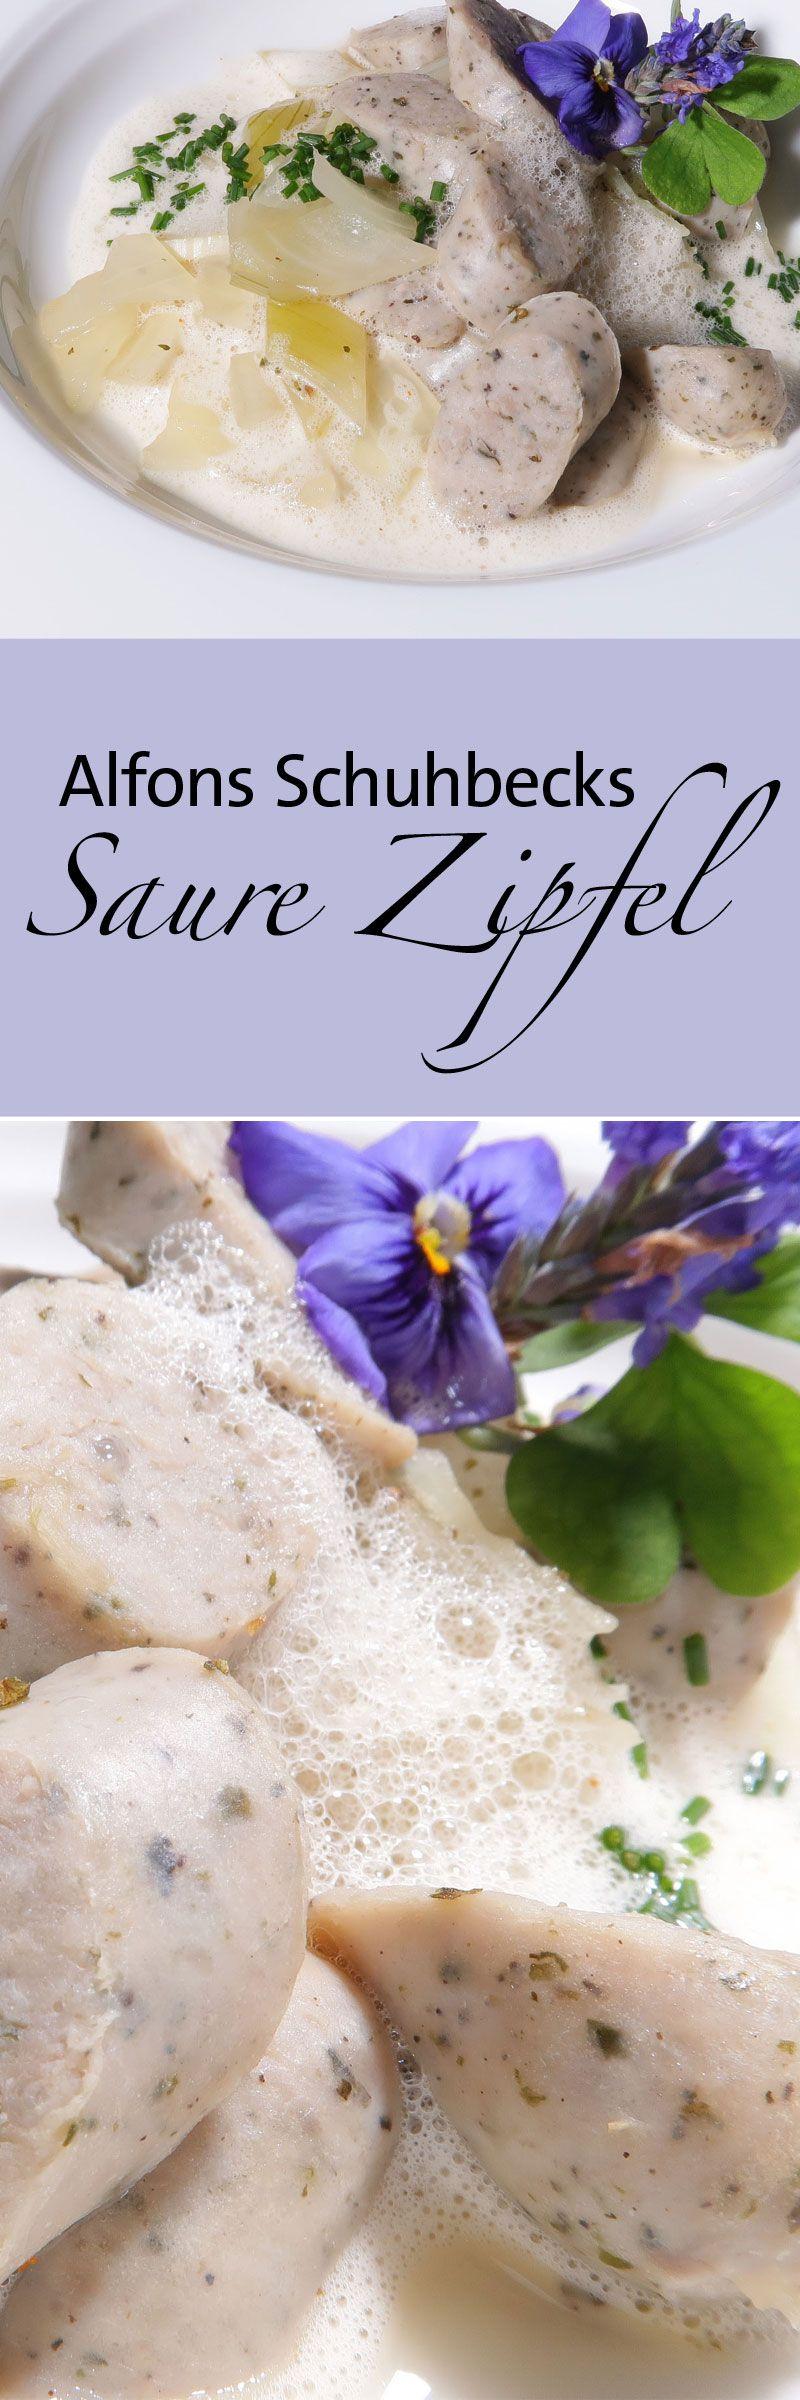 Bayerische Saure Zipfel